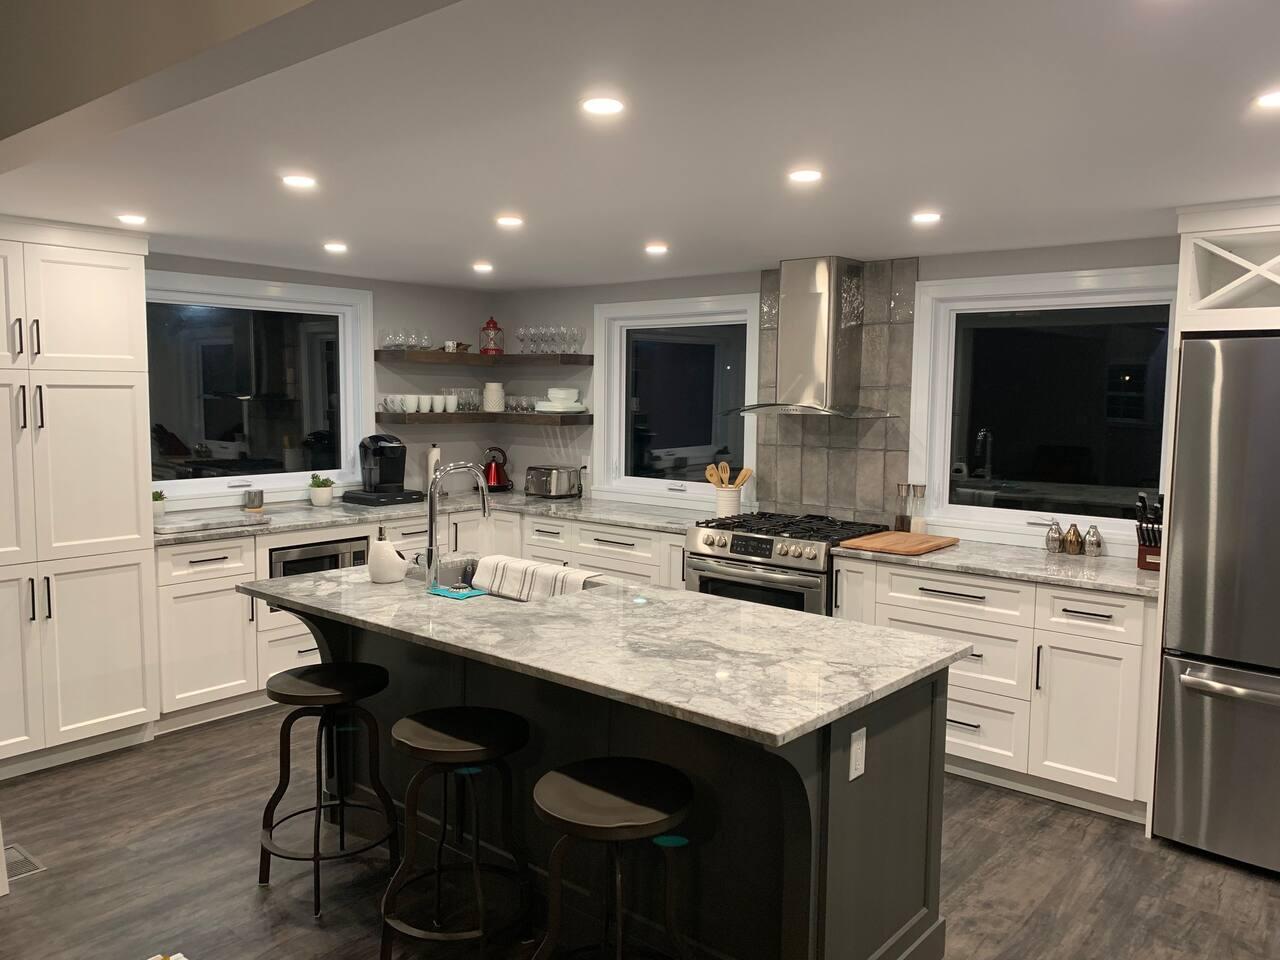 A light, bright kitchen